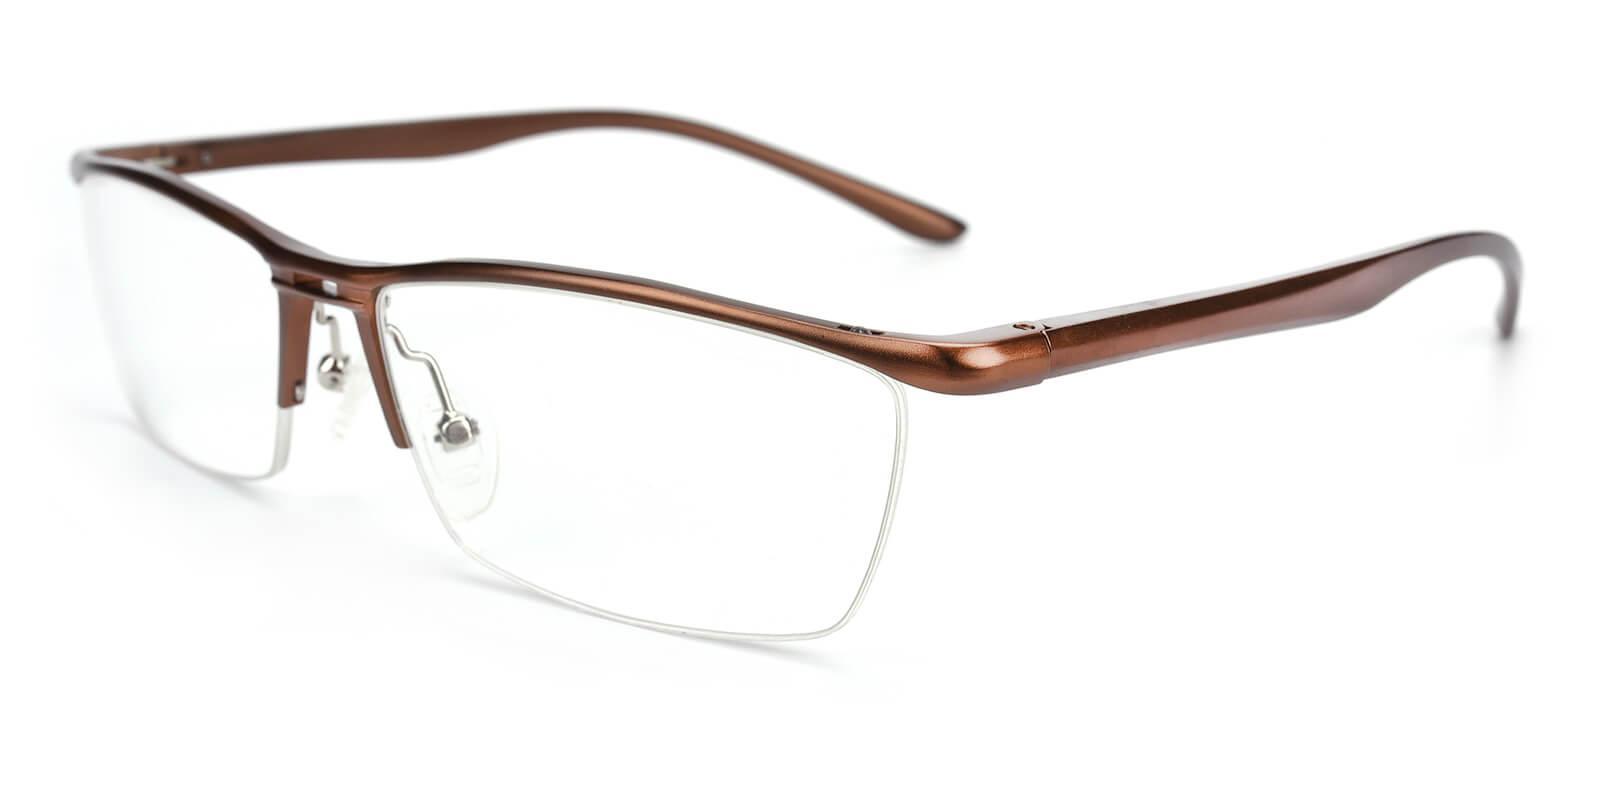 Vauseper-Brown-Rectangle-Metal-Eyeglasses-additional1